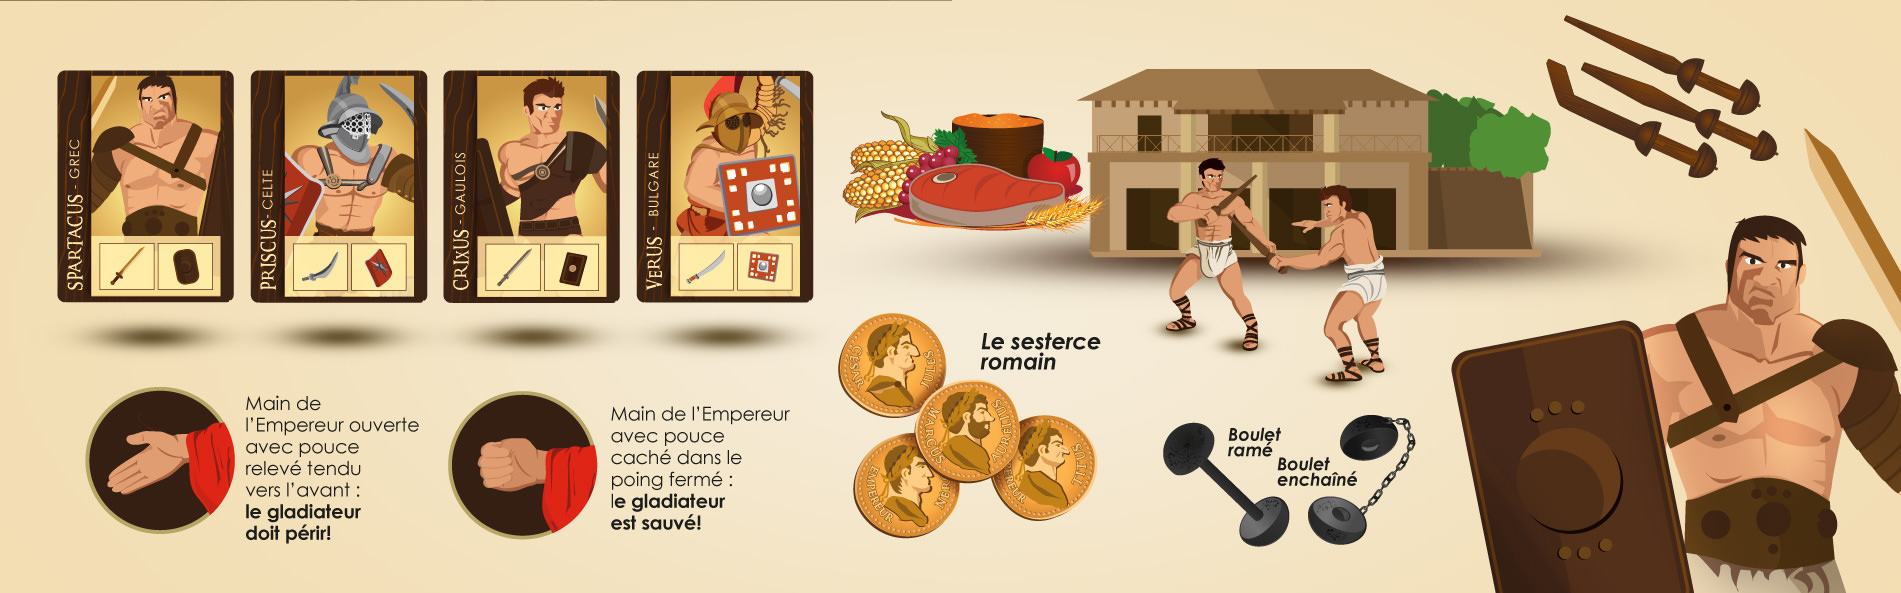 napperons-educatifs-3-petits-singes-gladiateurs.jpg